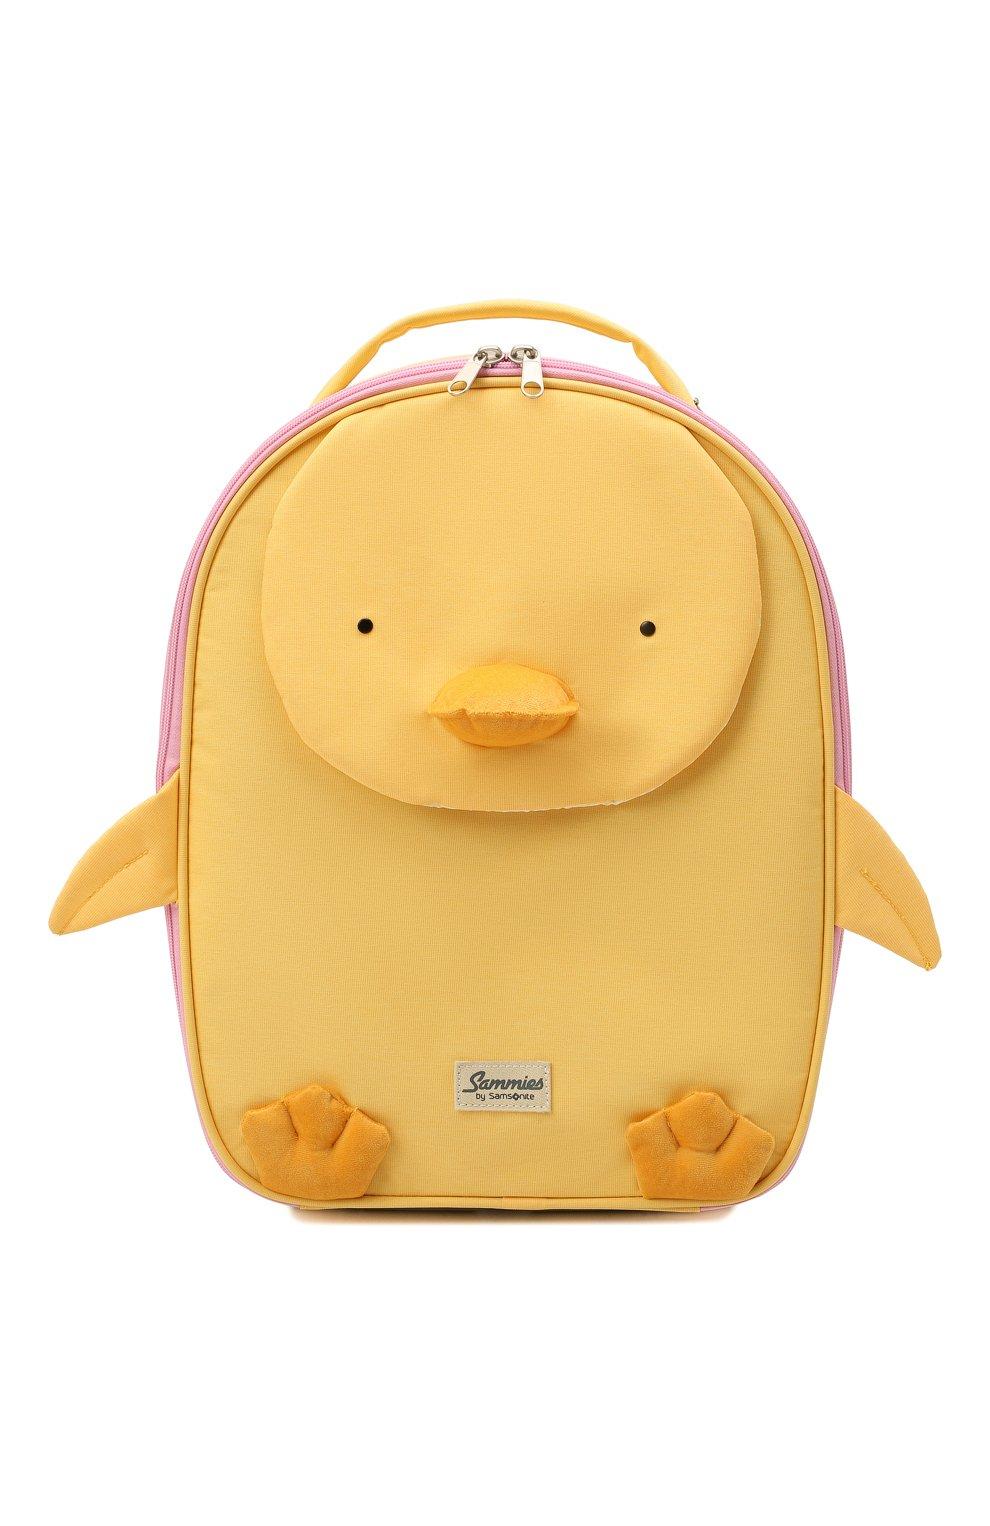 Детский чемодан happy sammies eco SAMSONITE желтого цвета, арт. KD7-06001   Фото 1 (Материал: Текстиль)